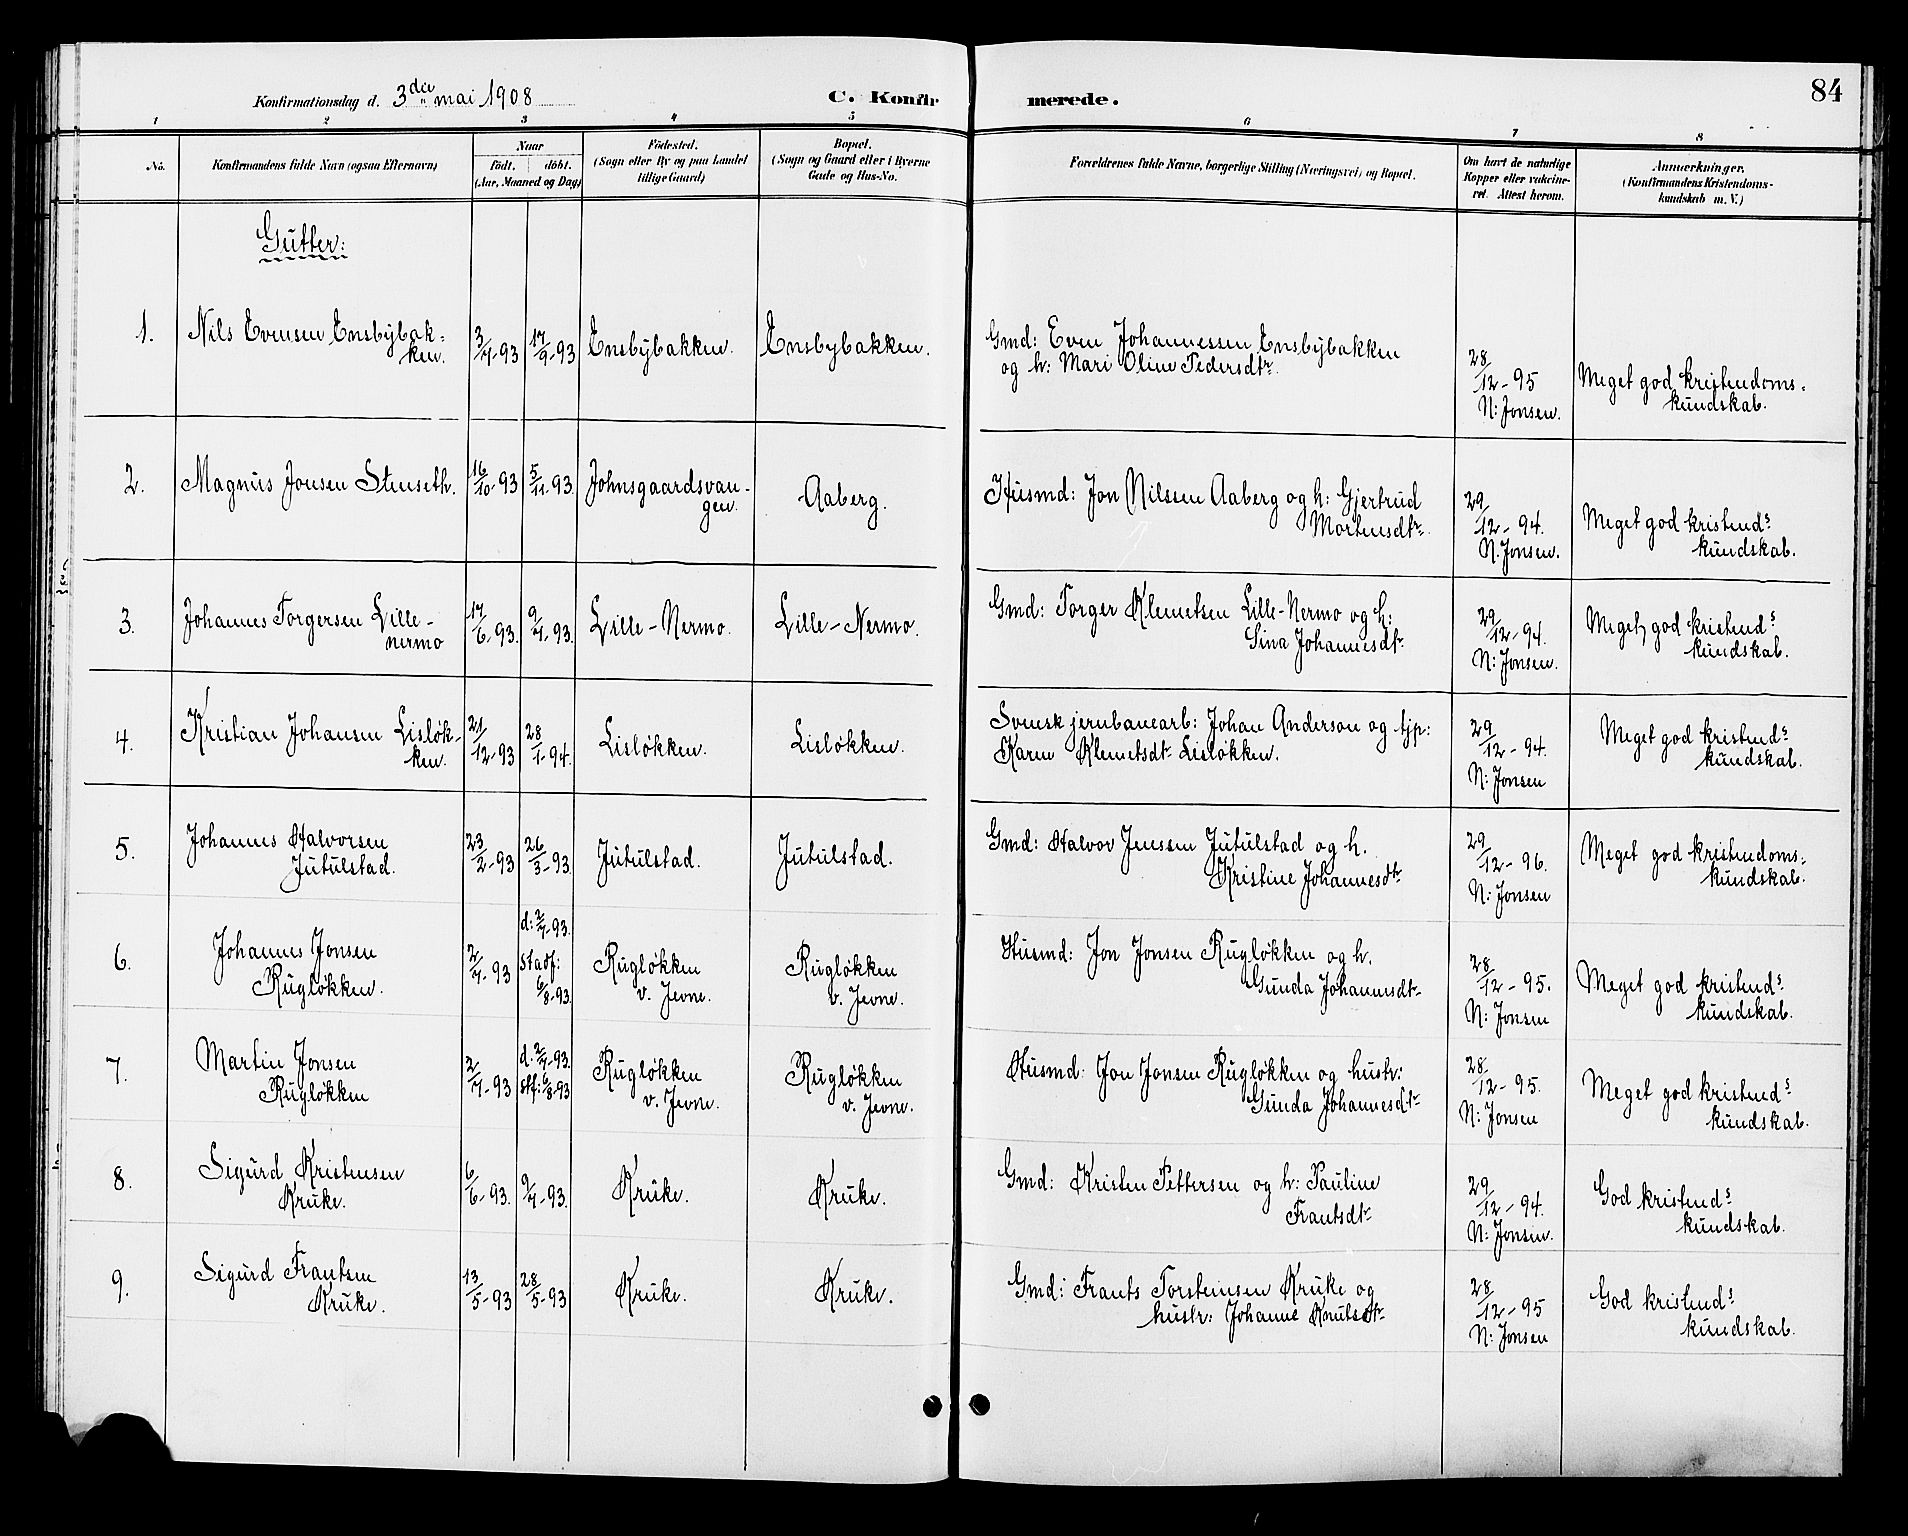 SAH, Øyer prestekontor, Klokkerbok nr. 5, 1897-1913, s. 84